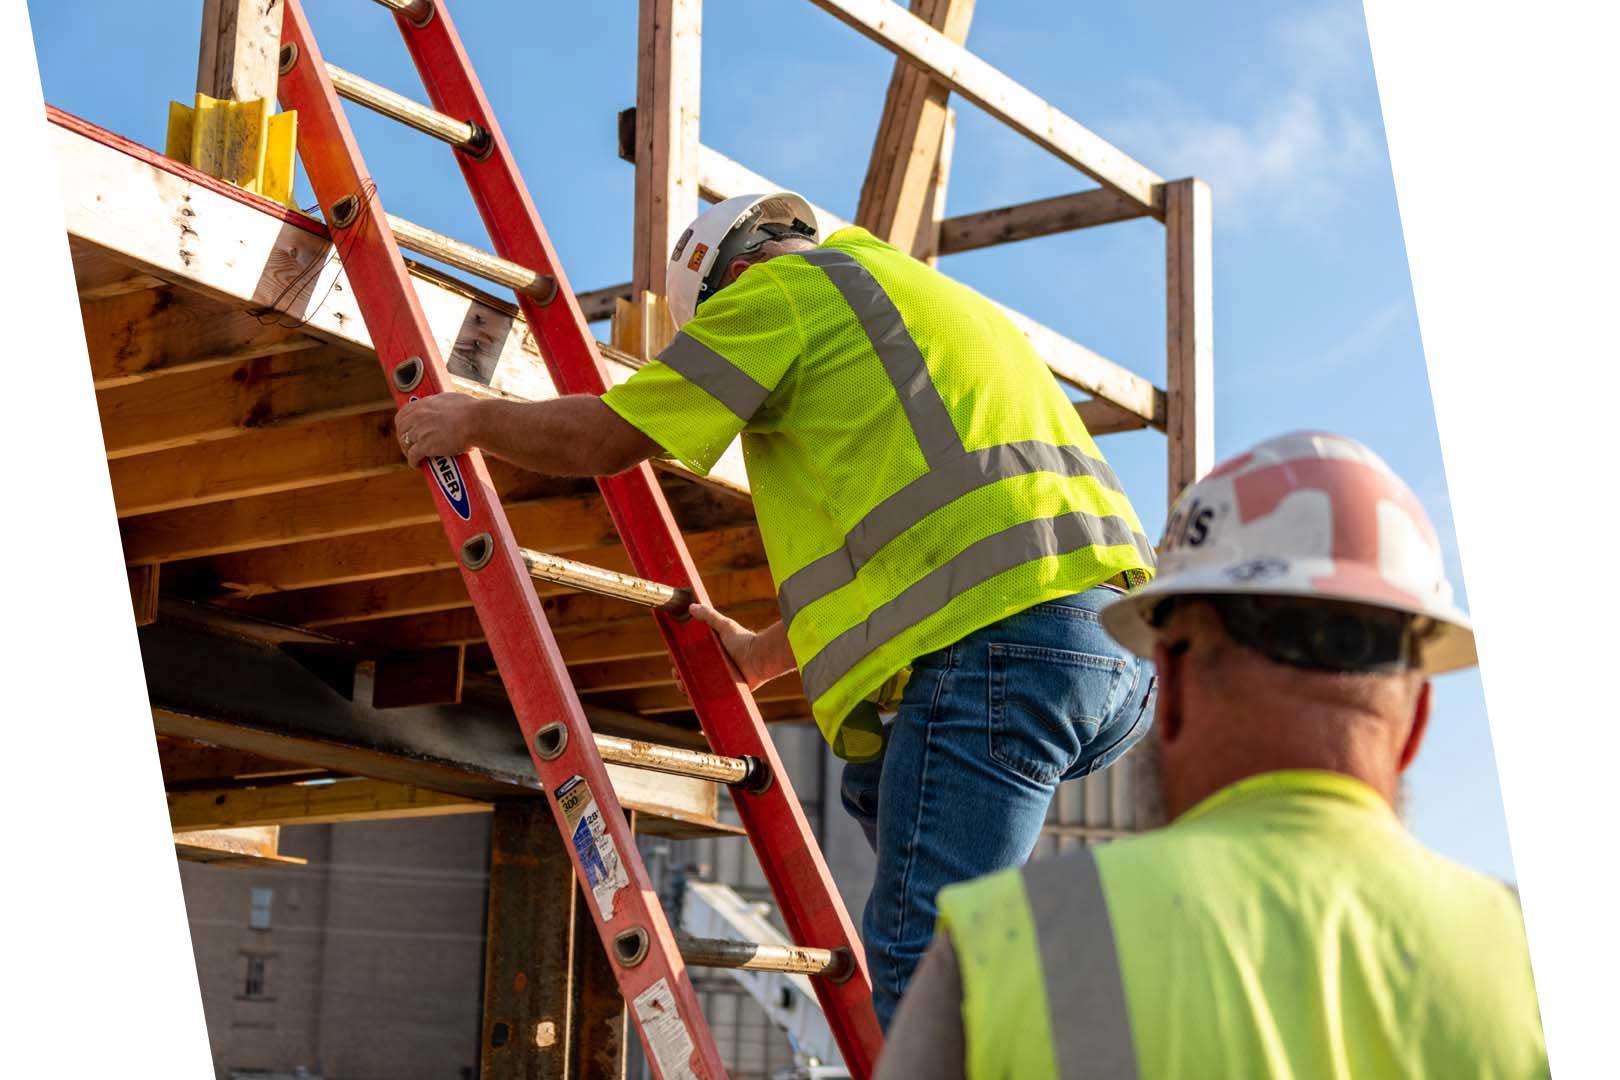 Construction worker going up a ladder